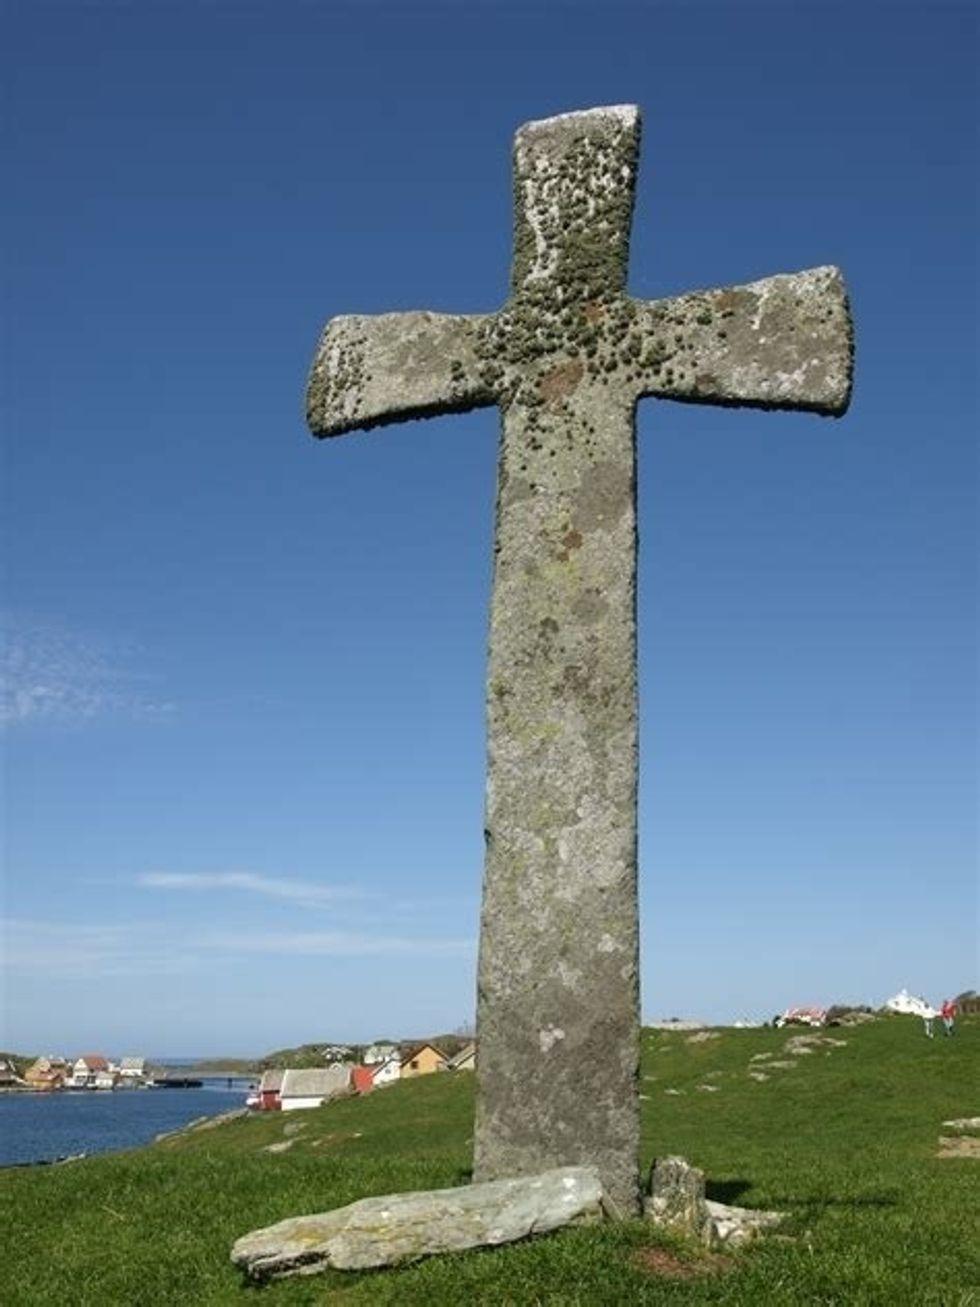 http://commons.wikimedia.org/wiki/File:Stone_cross,_Leiasundet,_Kvits%C3%B8y_Rogaland.jpg